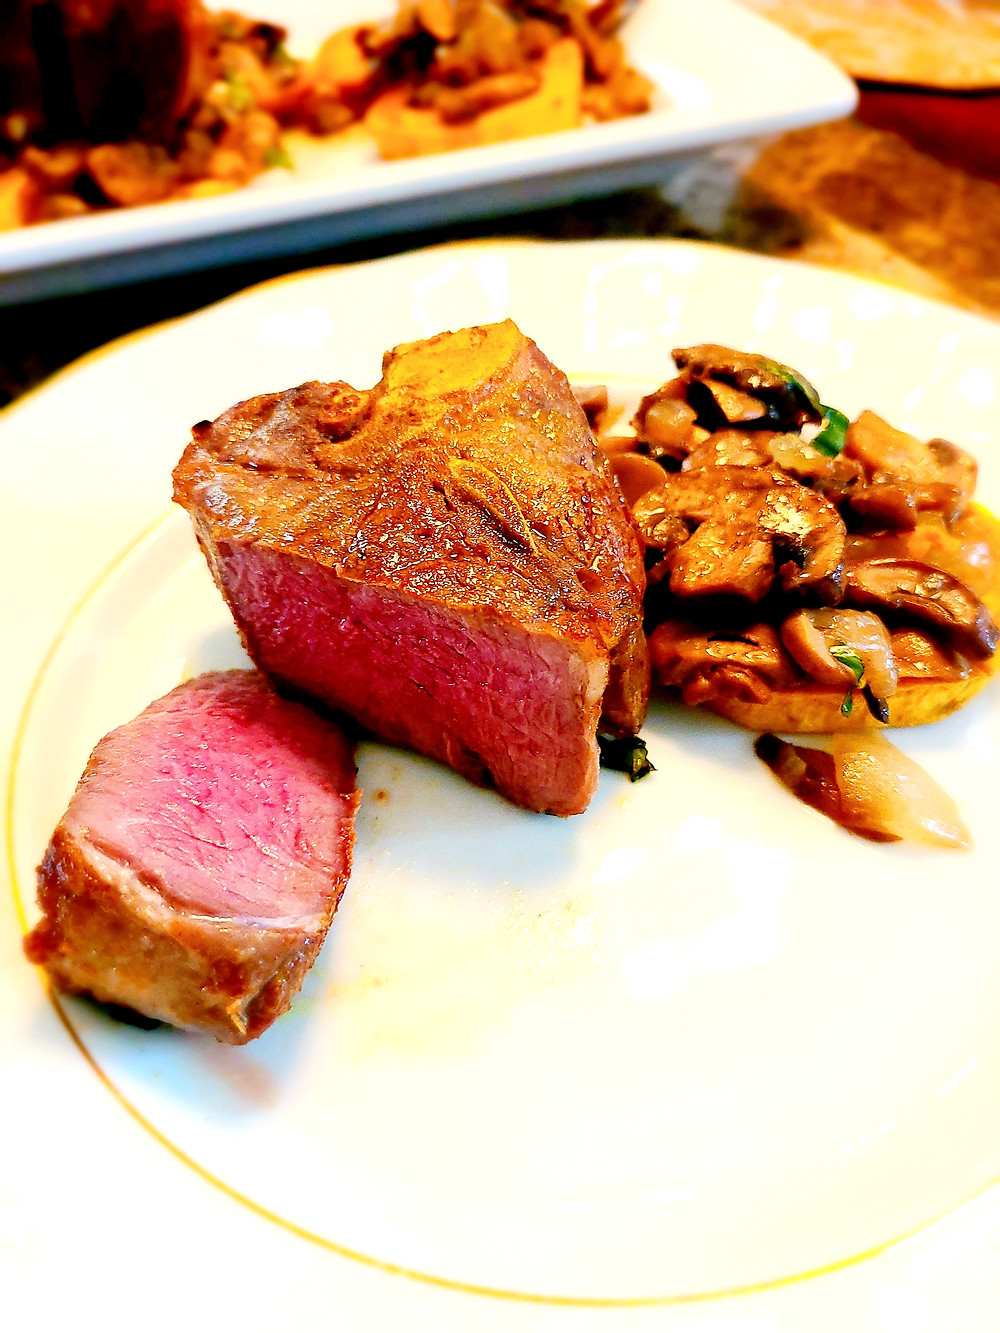 Tender, Juicy Sous Vide Lamb Loin Chops (Gluten-free, dairy-free, grain-free, soy-free, AIP)